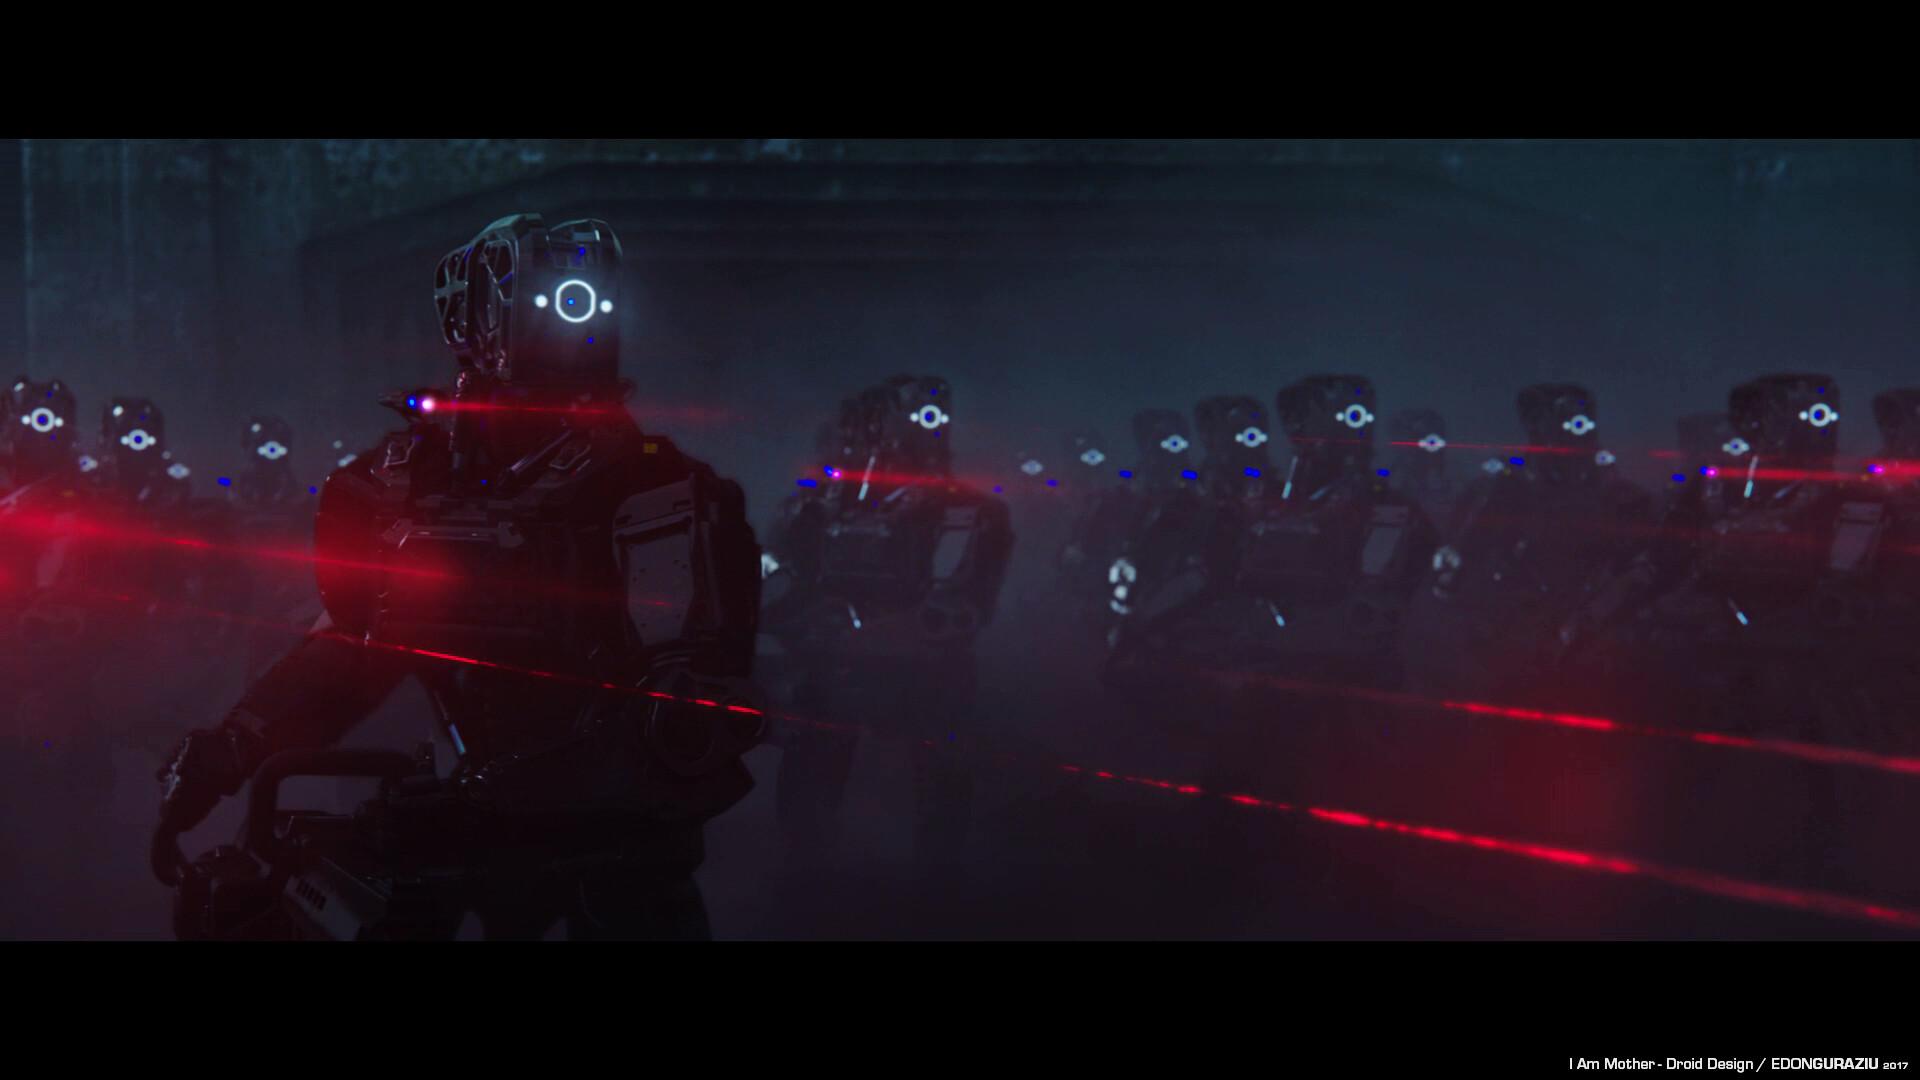 IAMMOTHER - 6Robots.jpg